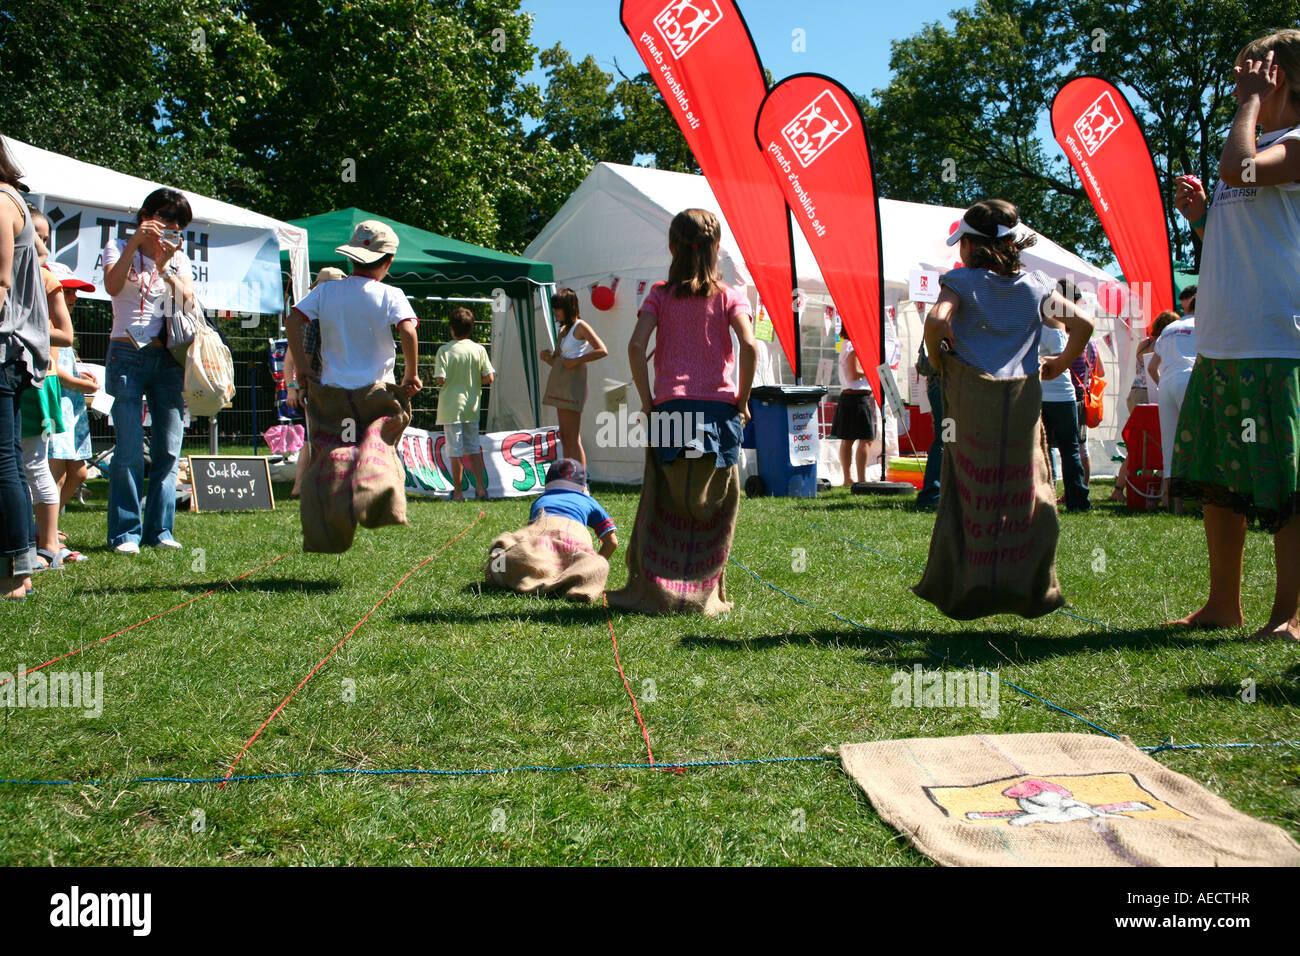 Sack race at Innocent Village Fete, London - Stock Image